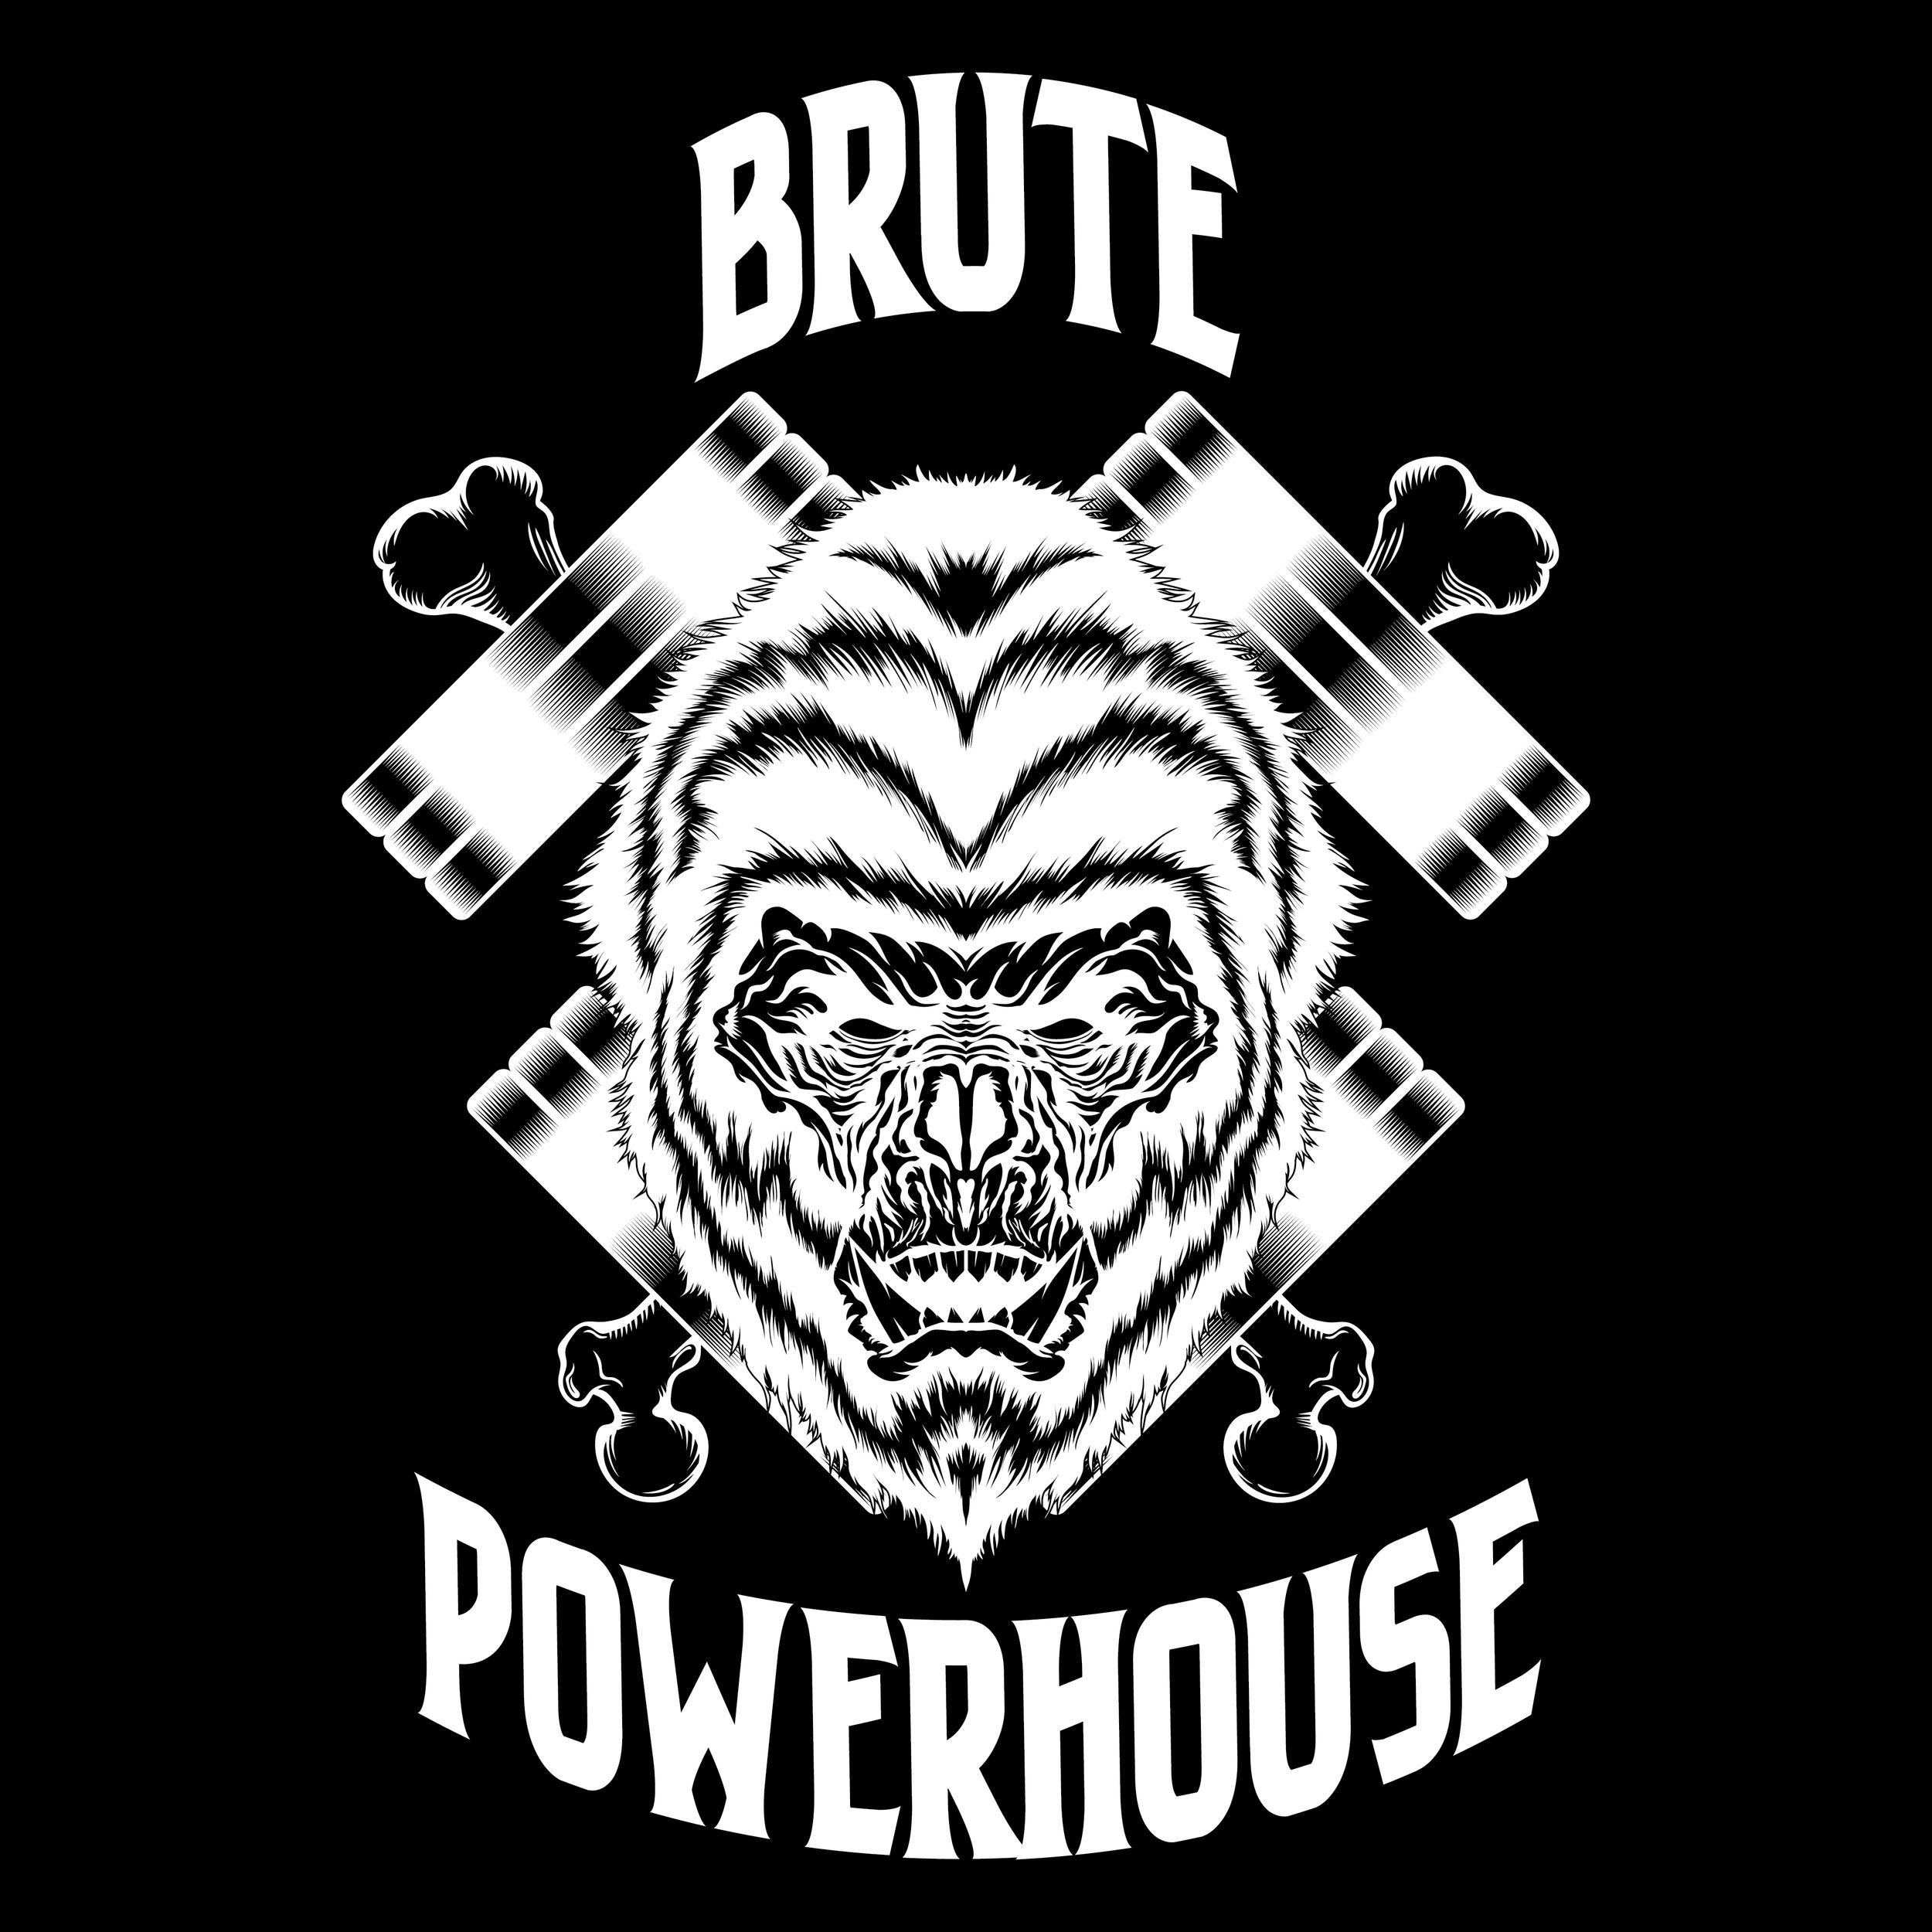 brute-powerhouse-illustration-logo-adobe-illustrator-vector-art-artist-gorilla-monster-ape-savage-gym-crossfit-powerlifting-roberto-orozco-design-graphic-designer-black-white-crossbones-3.jpg